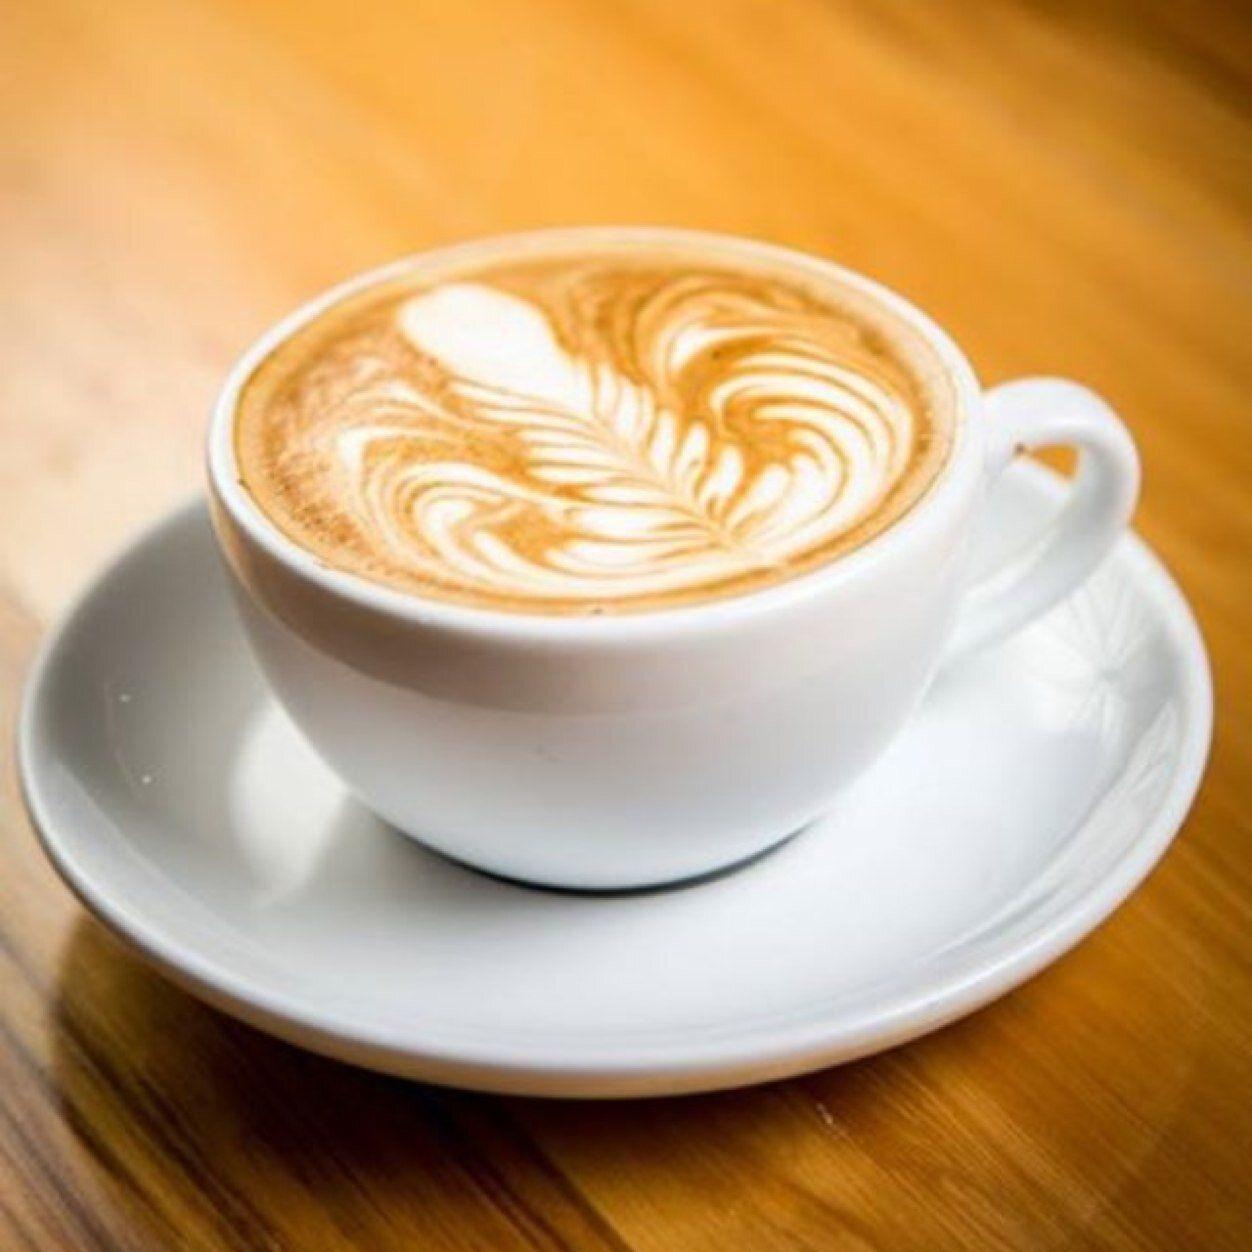 Boutique Espresso Boutiqueesphob Coffee Latte Art Aesthetic Coffee Latte Art